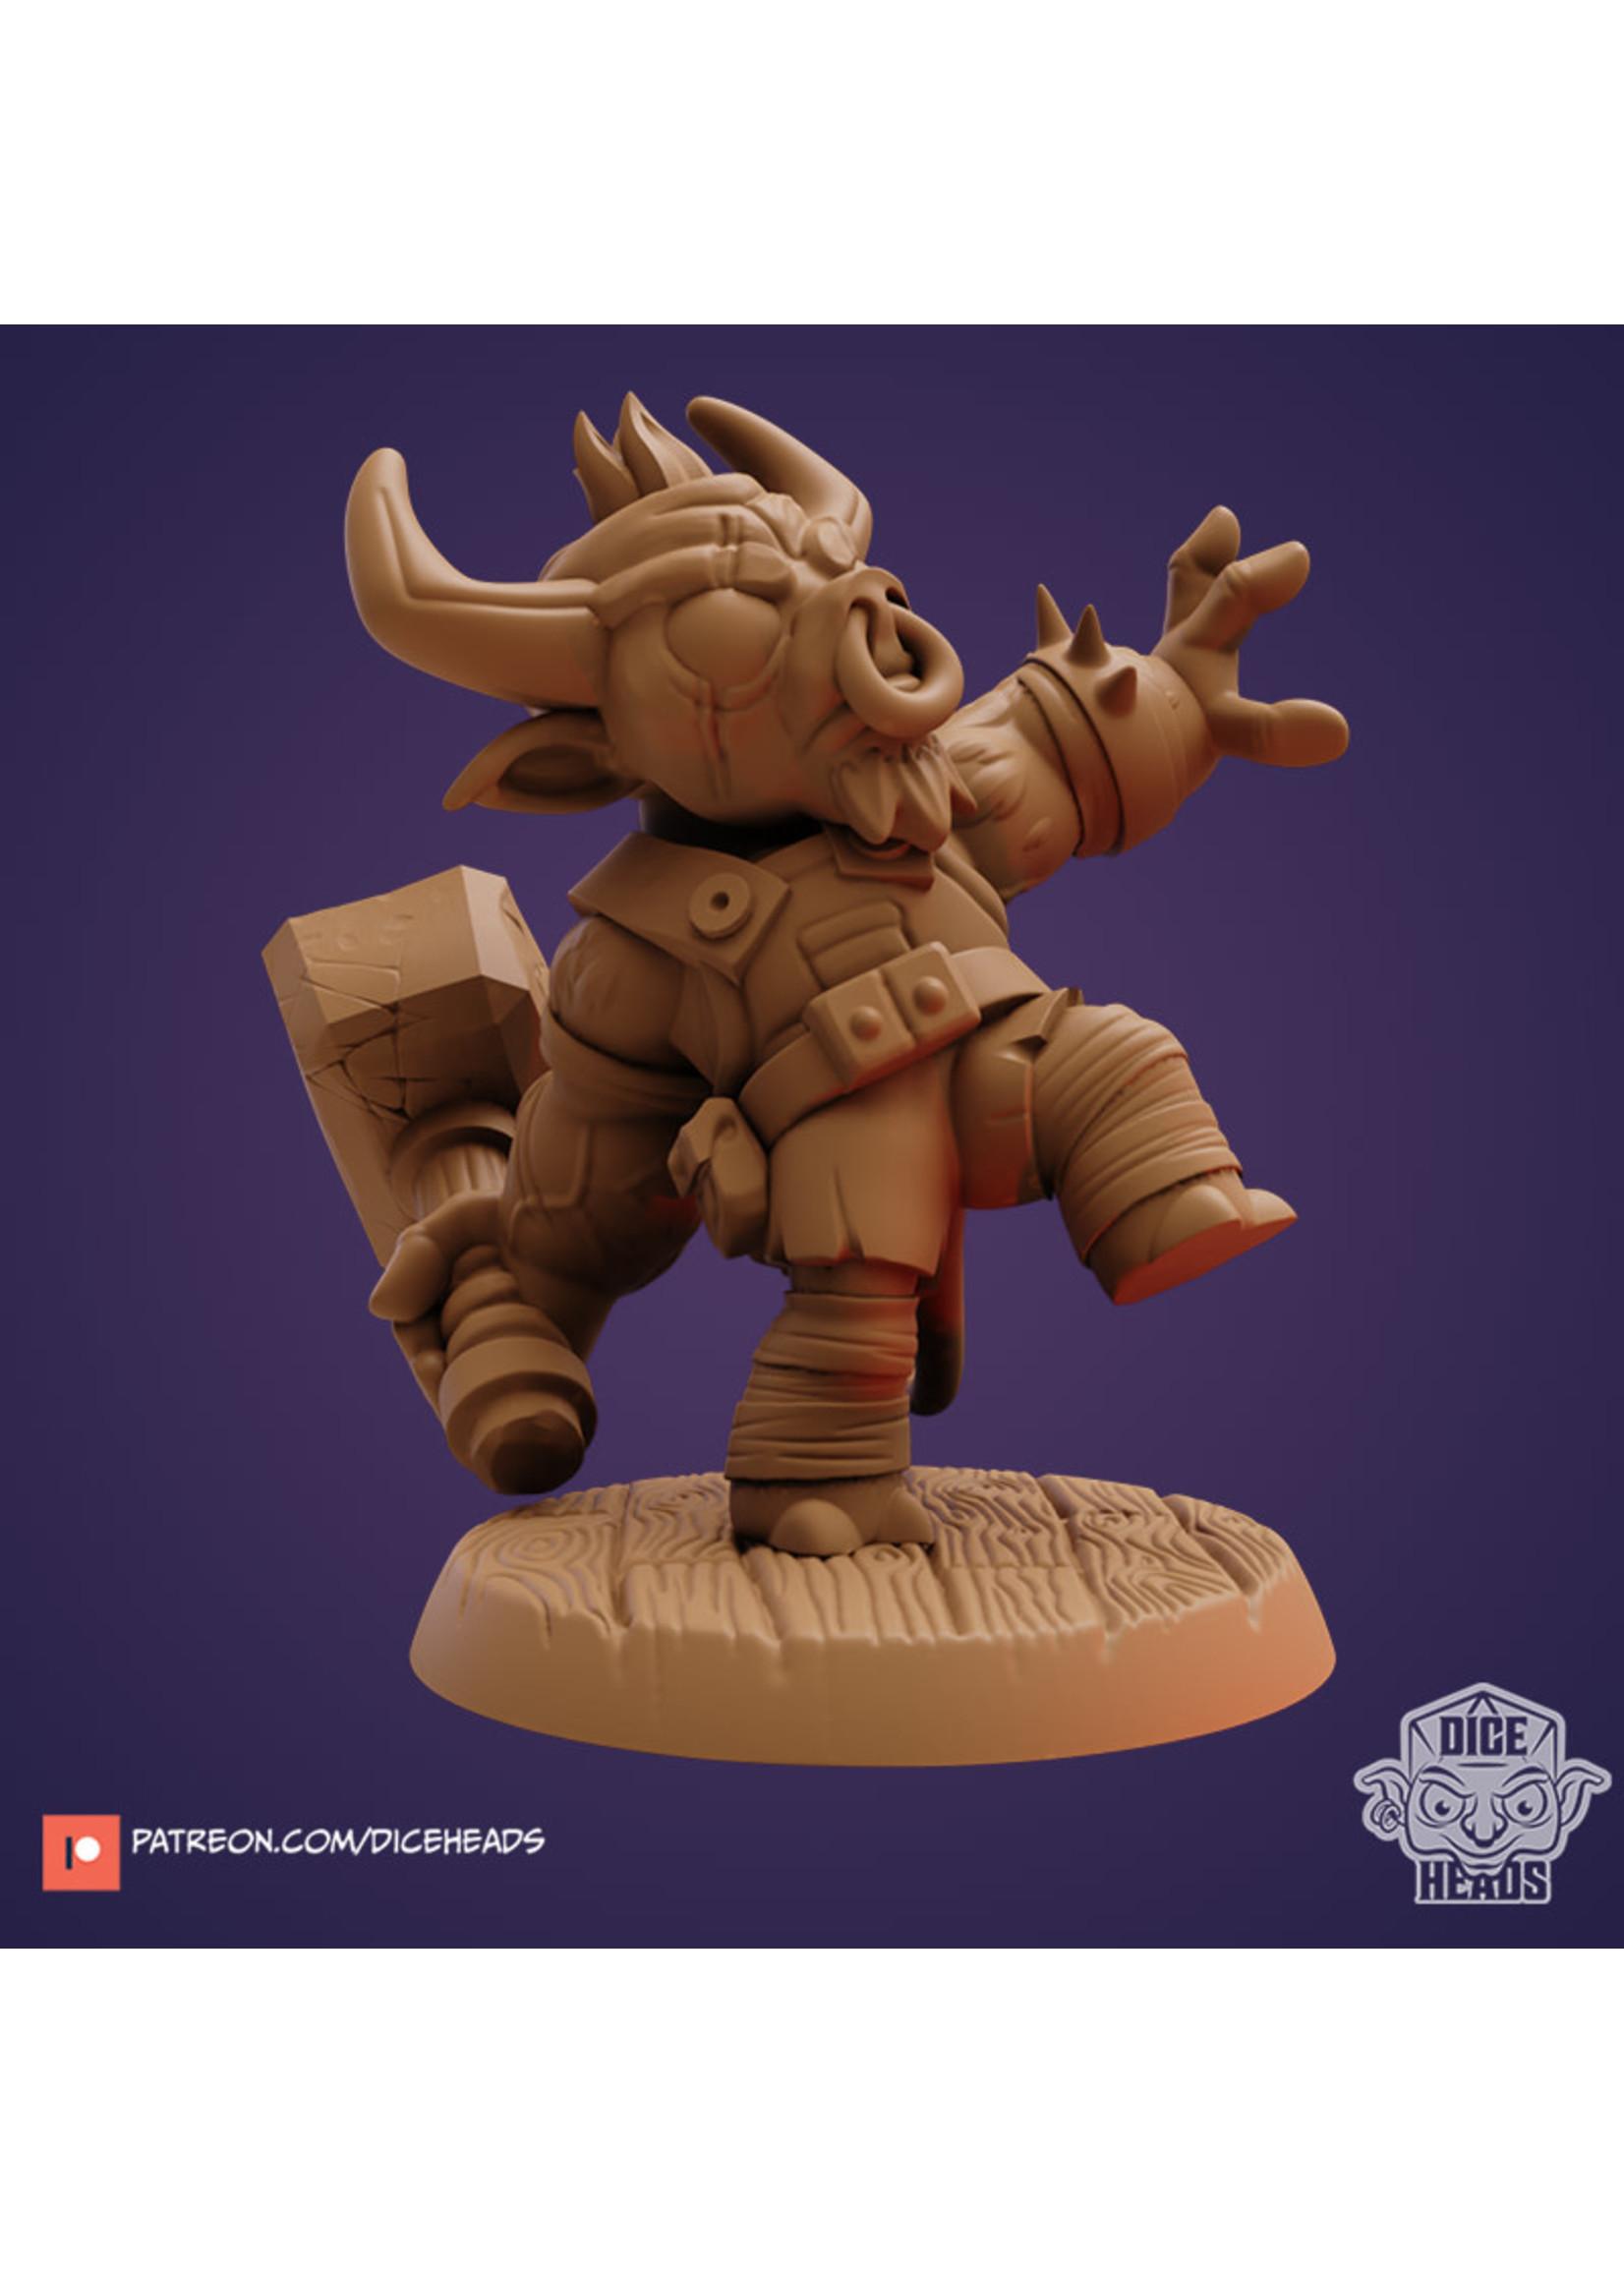 3D Printed Miniature - Torex Minotaur Barbarian - Dungeons & Dragons - Zoontalis KS